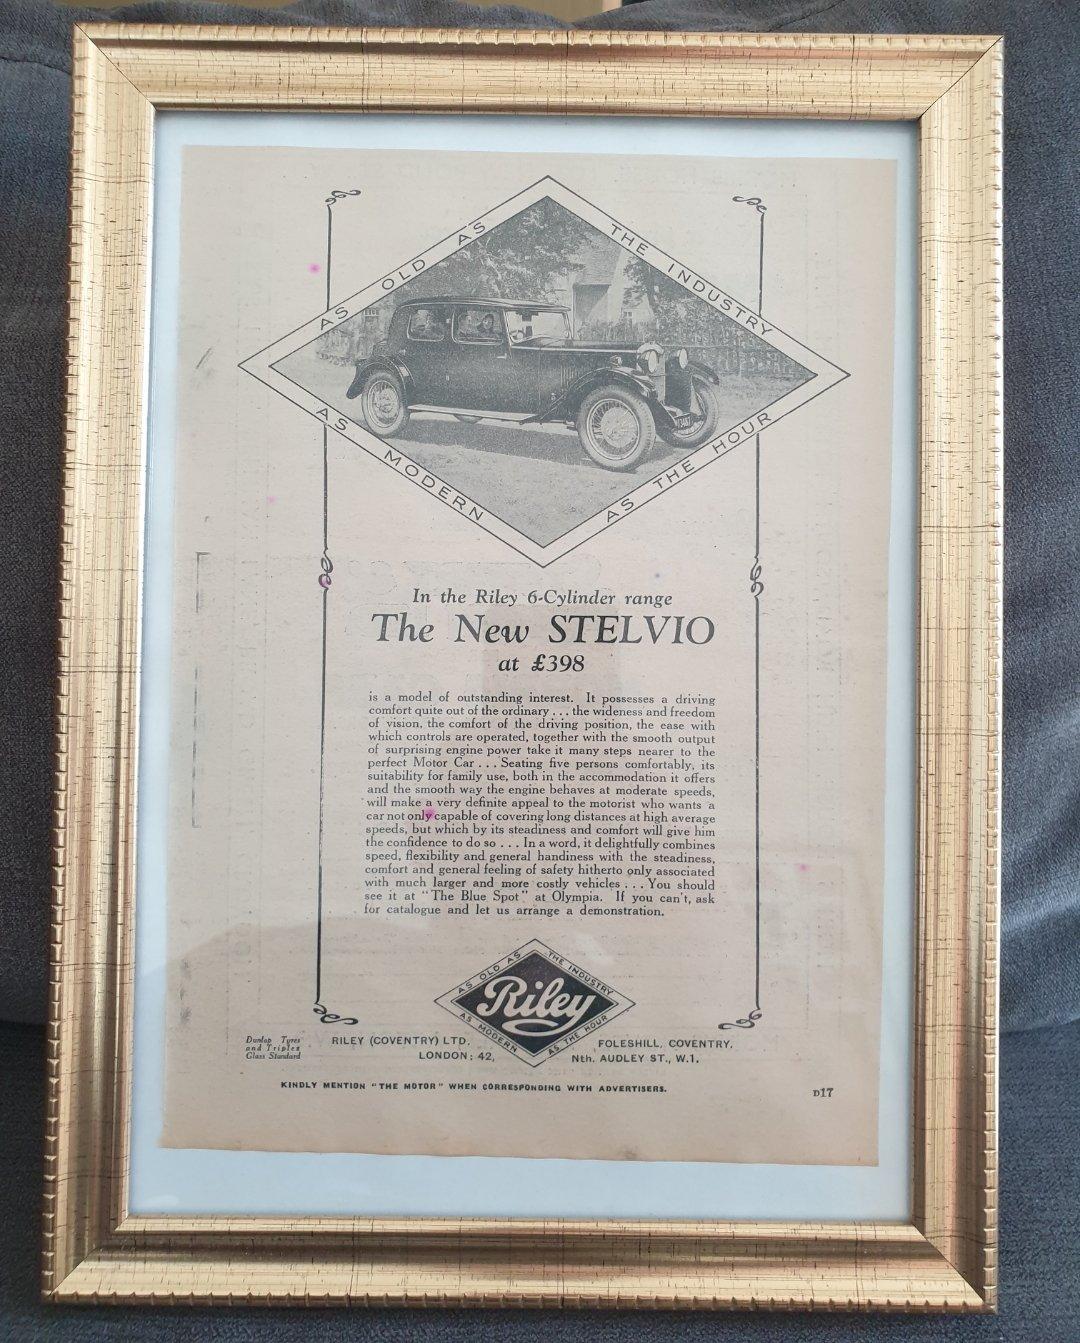 1964 Original 1930 Riley Stelvio Framed Advert  For Sale (picture 1 of 3)